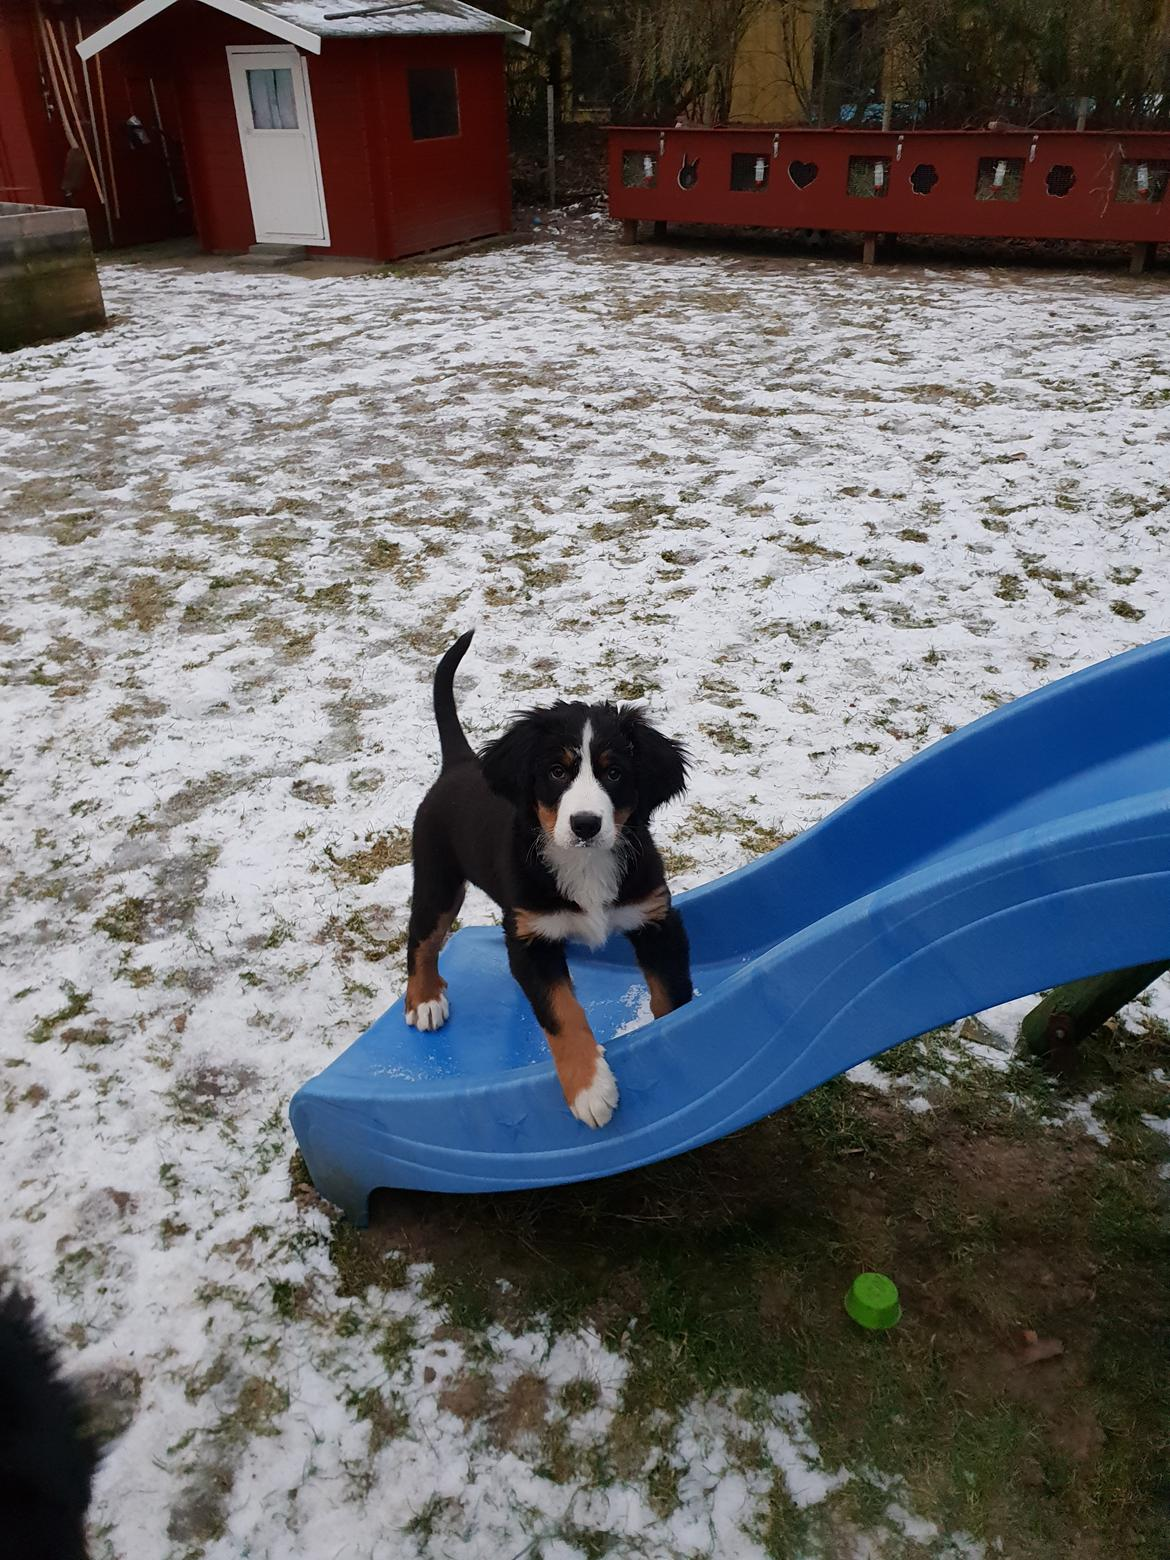 Berner sennenhund Toffie billede 31